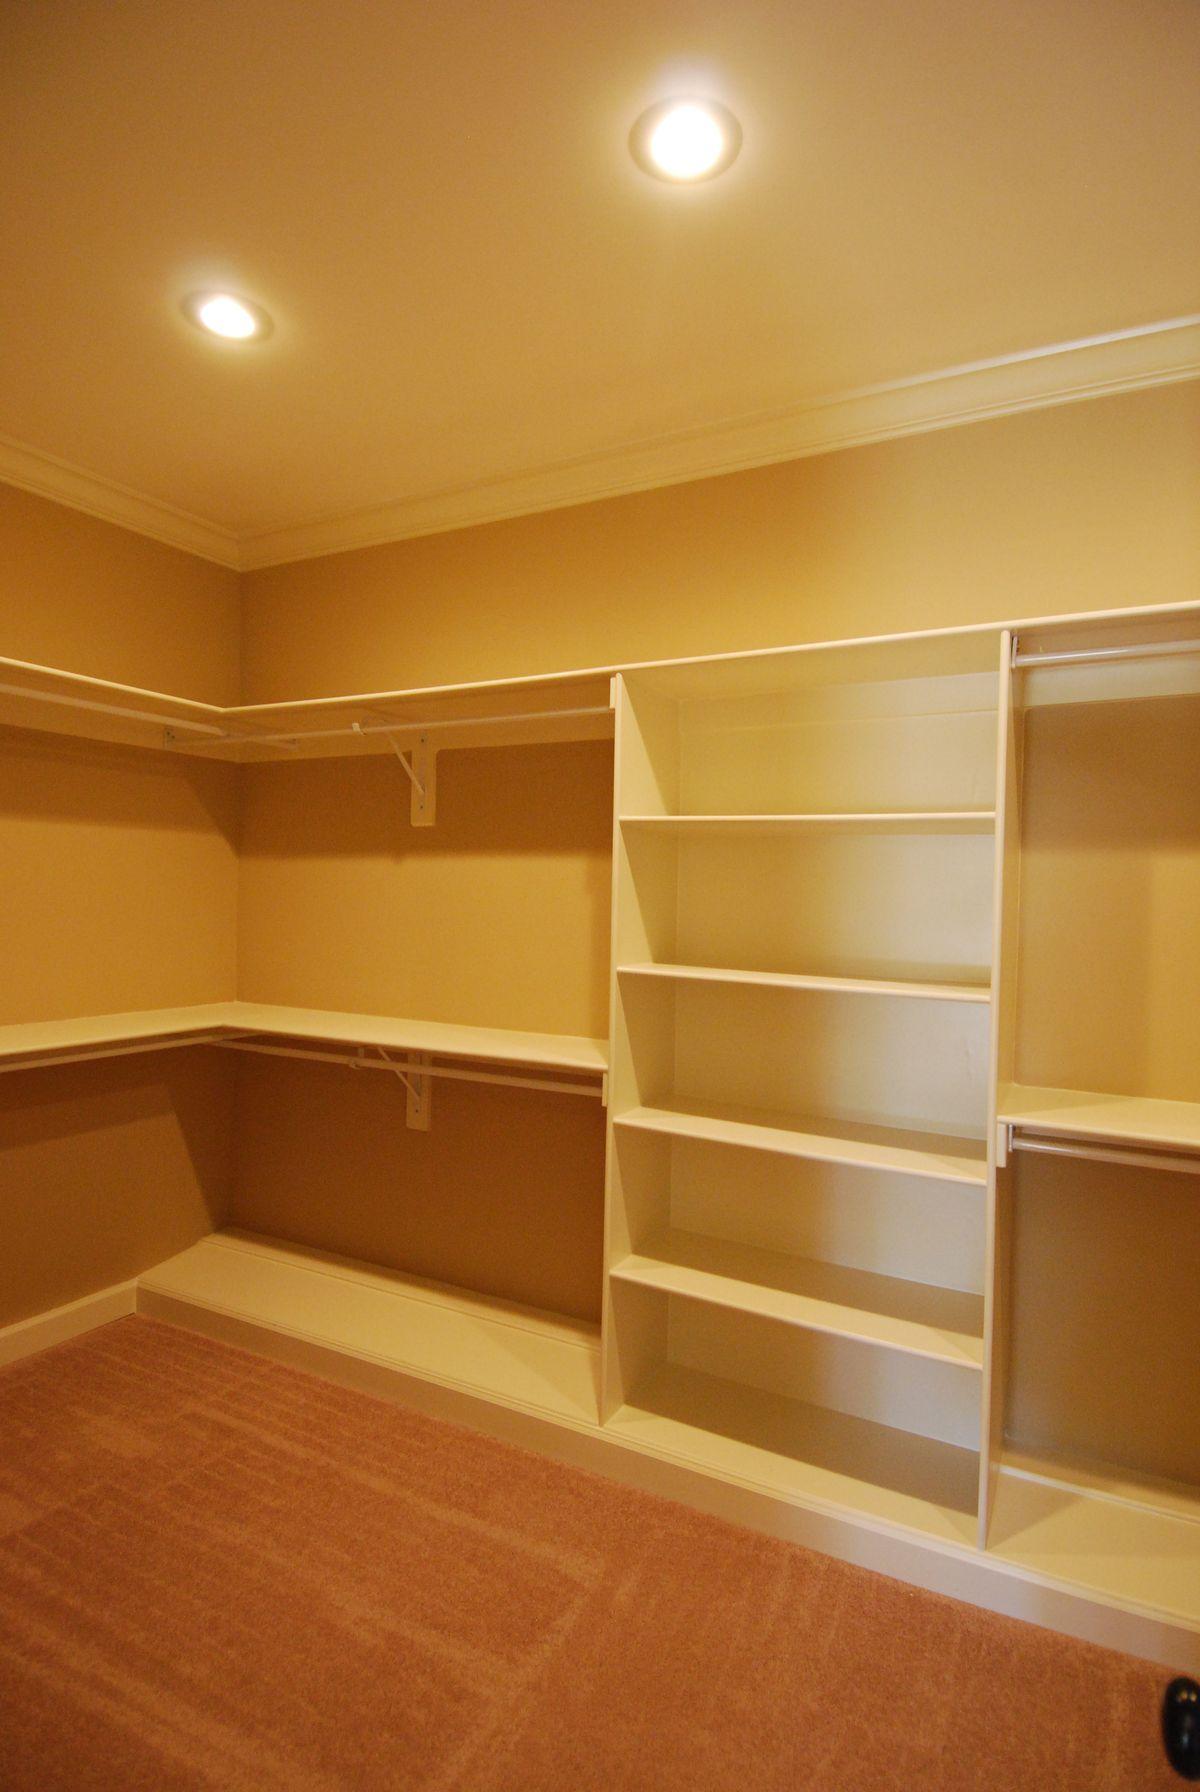 closet martha stewart and the closet on pinterest. Black Bedroom Furniture Sets. Home Design Ideas